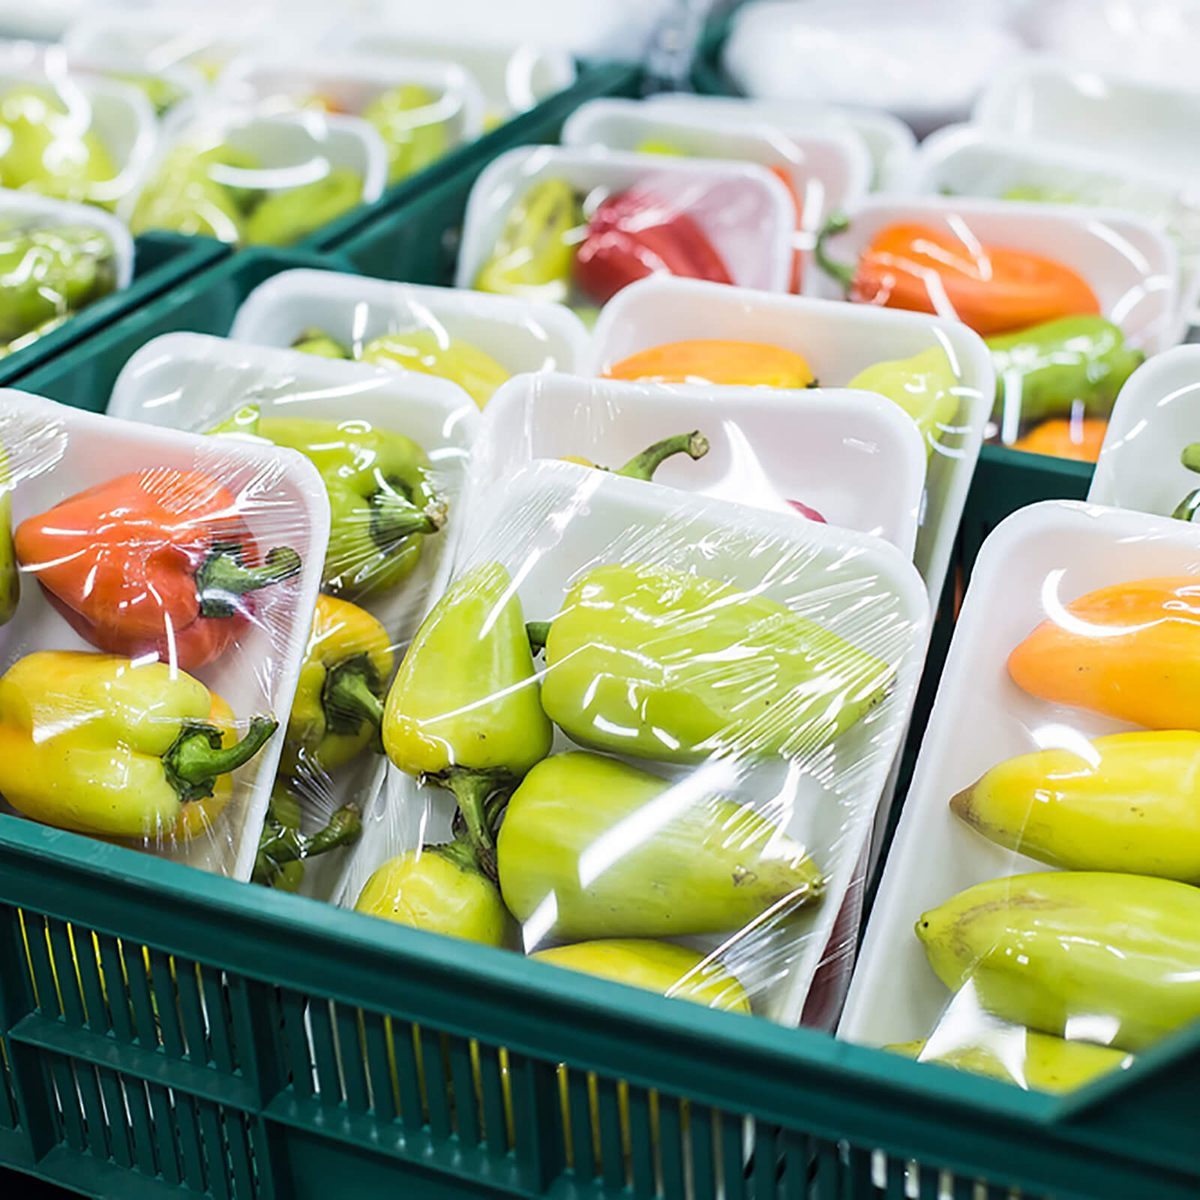 Bulgarian pepper in a box on a shelf in a supermarket; Shutterstock ID 551060236